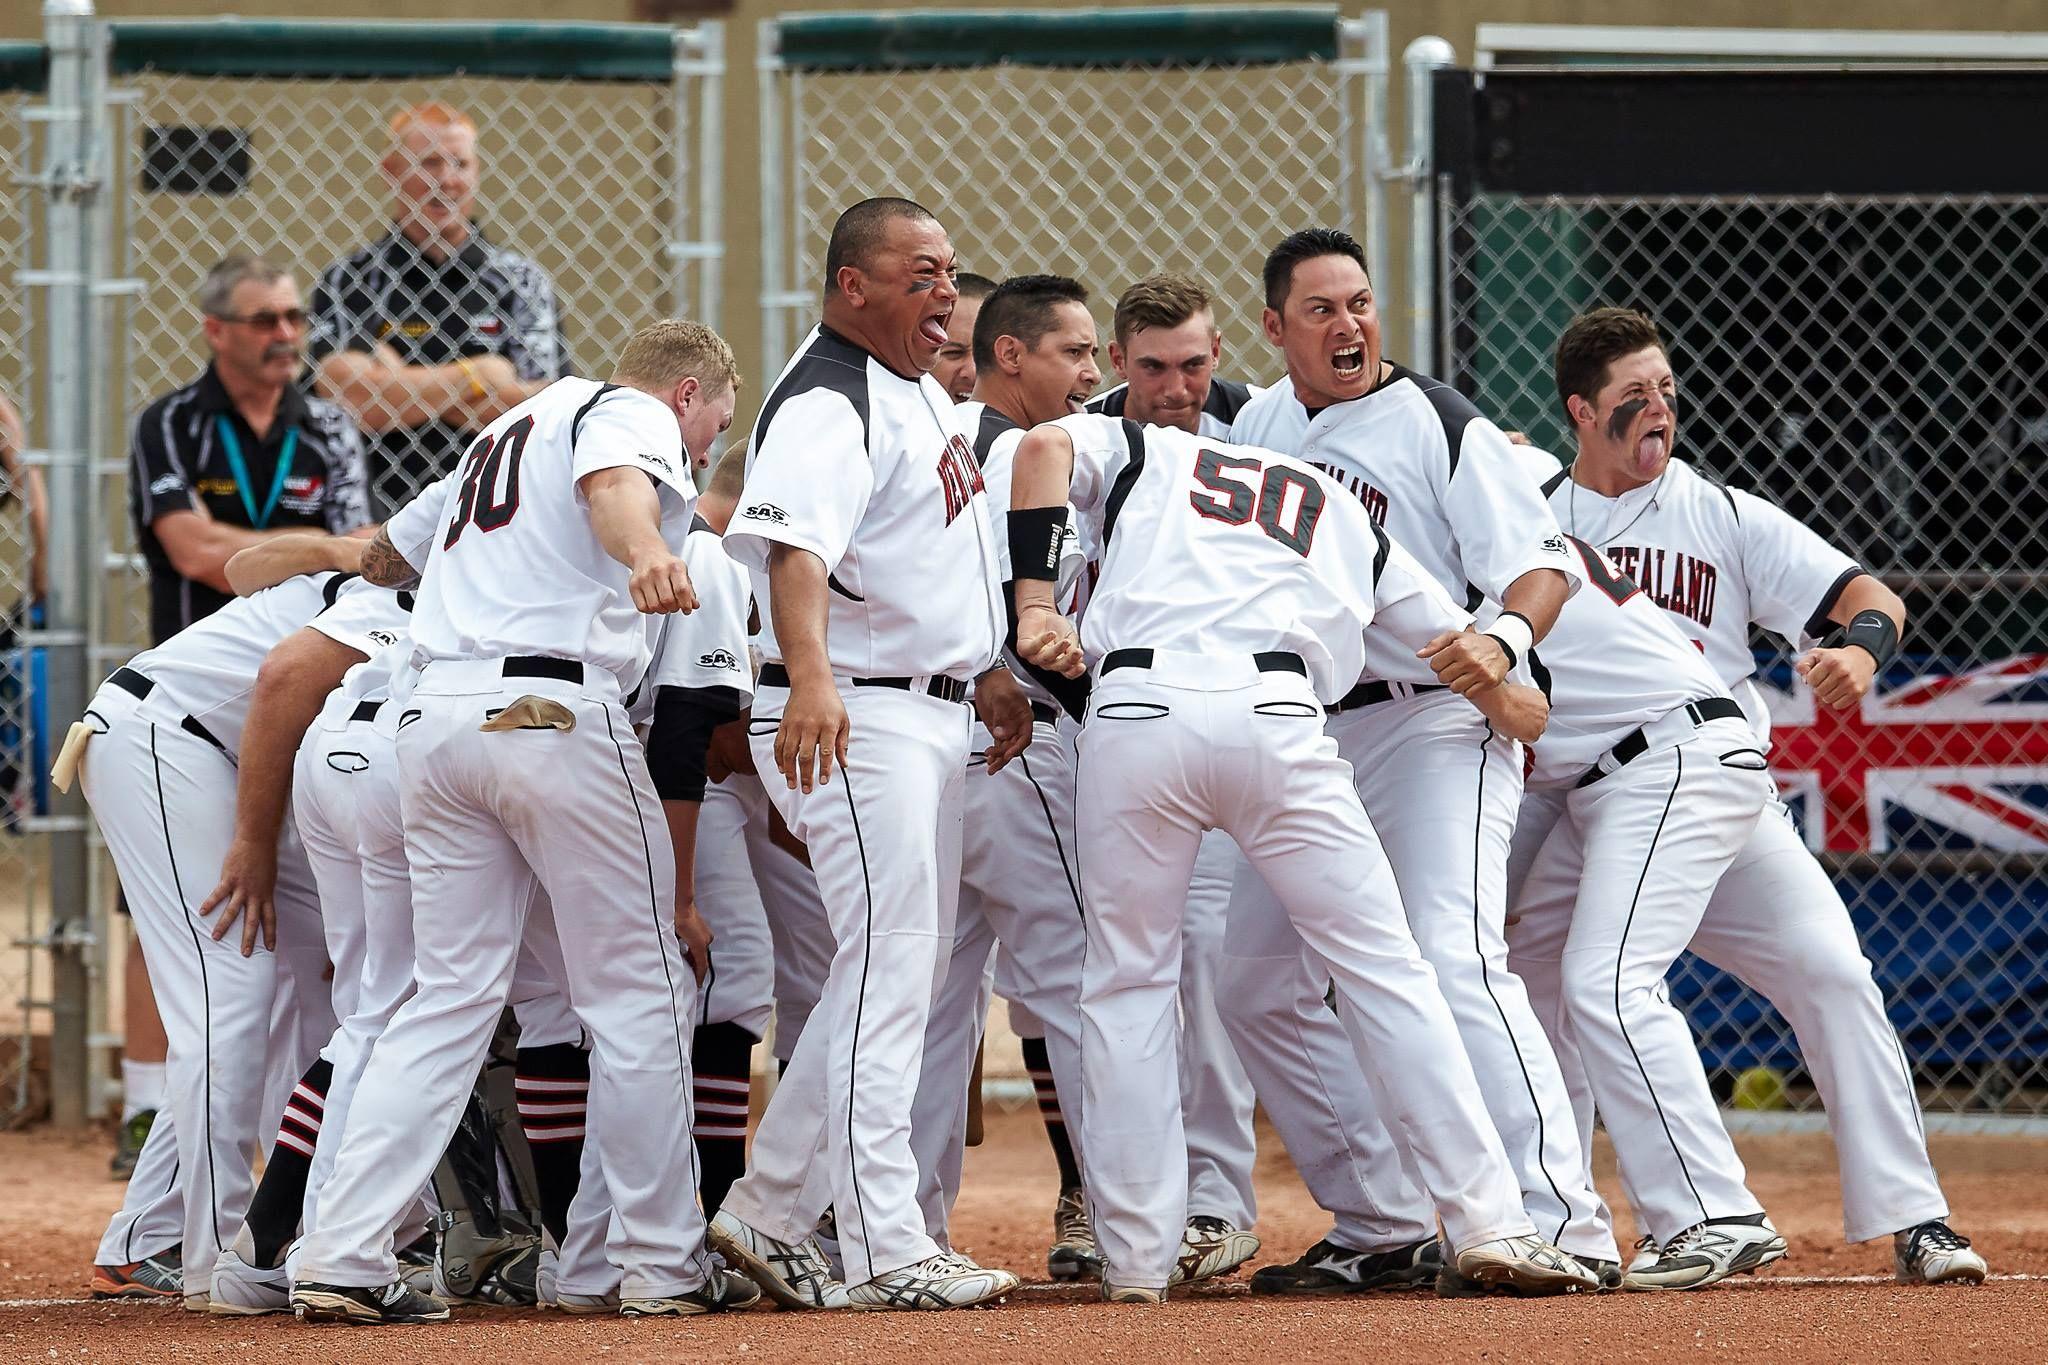 2015 – Saskatoon, ISF Men's World Championship- Softball Black Sox